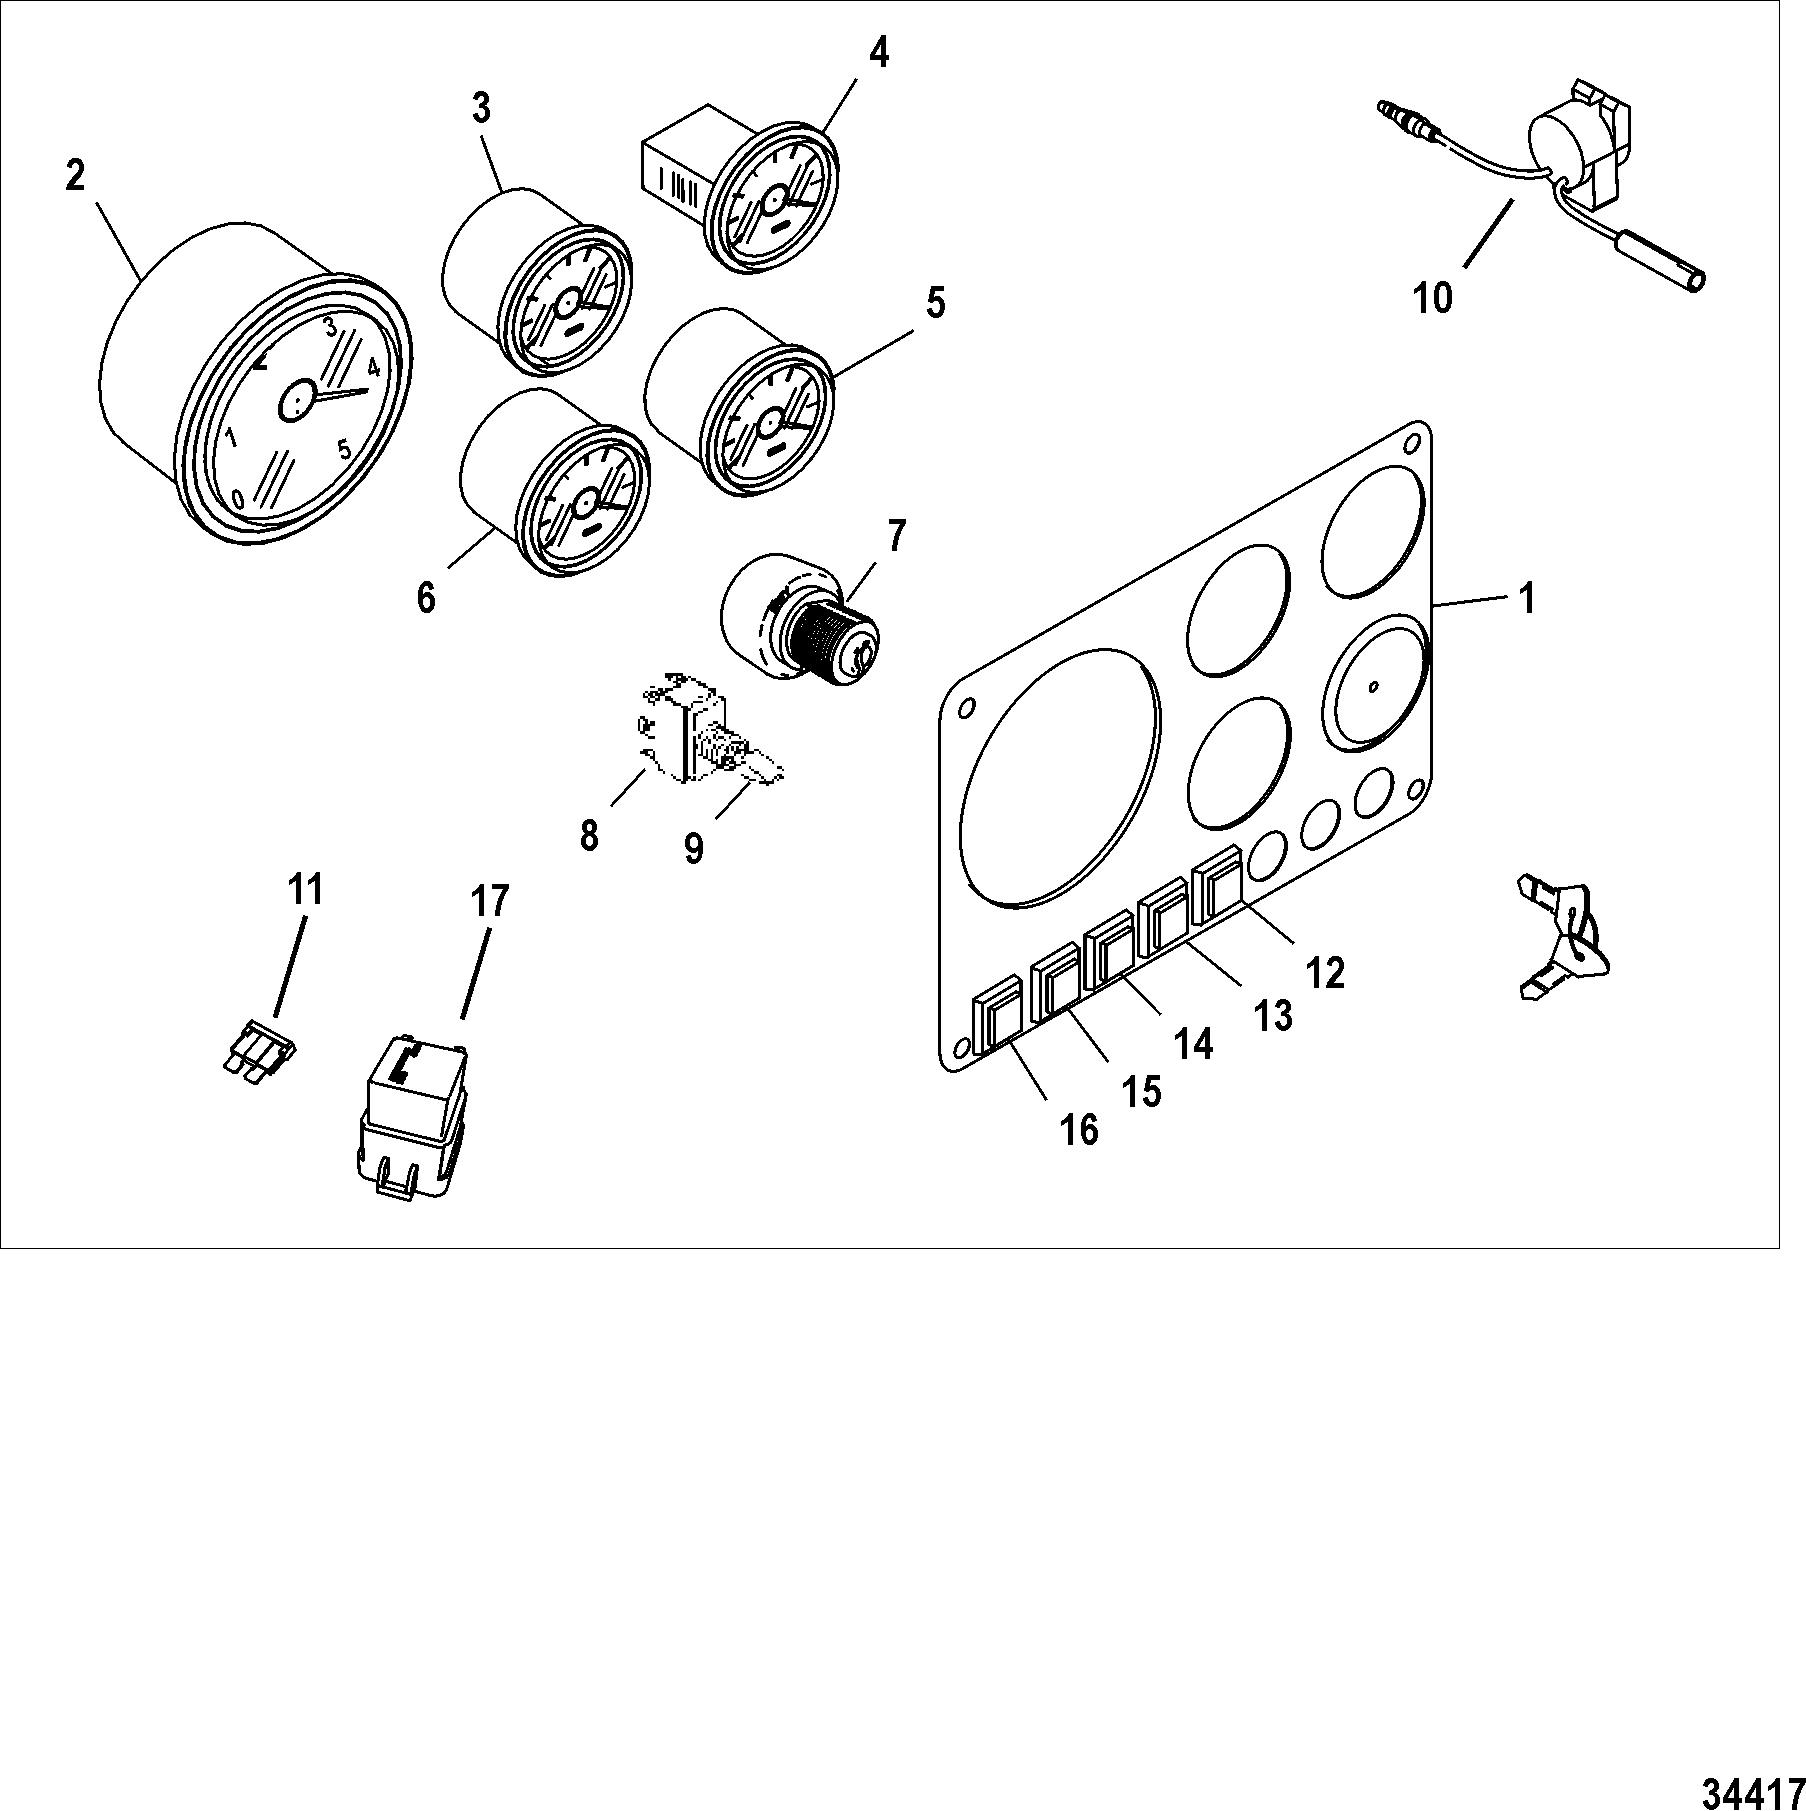 mercruiser cmd 1 7 mi 120 i l4 88109041 3.0 Mercruiser Trim Wiring Diagram instrument panel kit ponents full